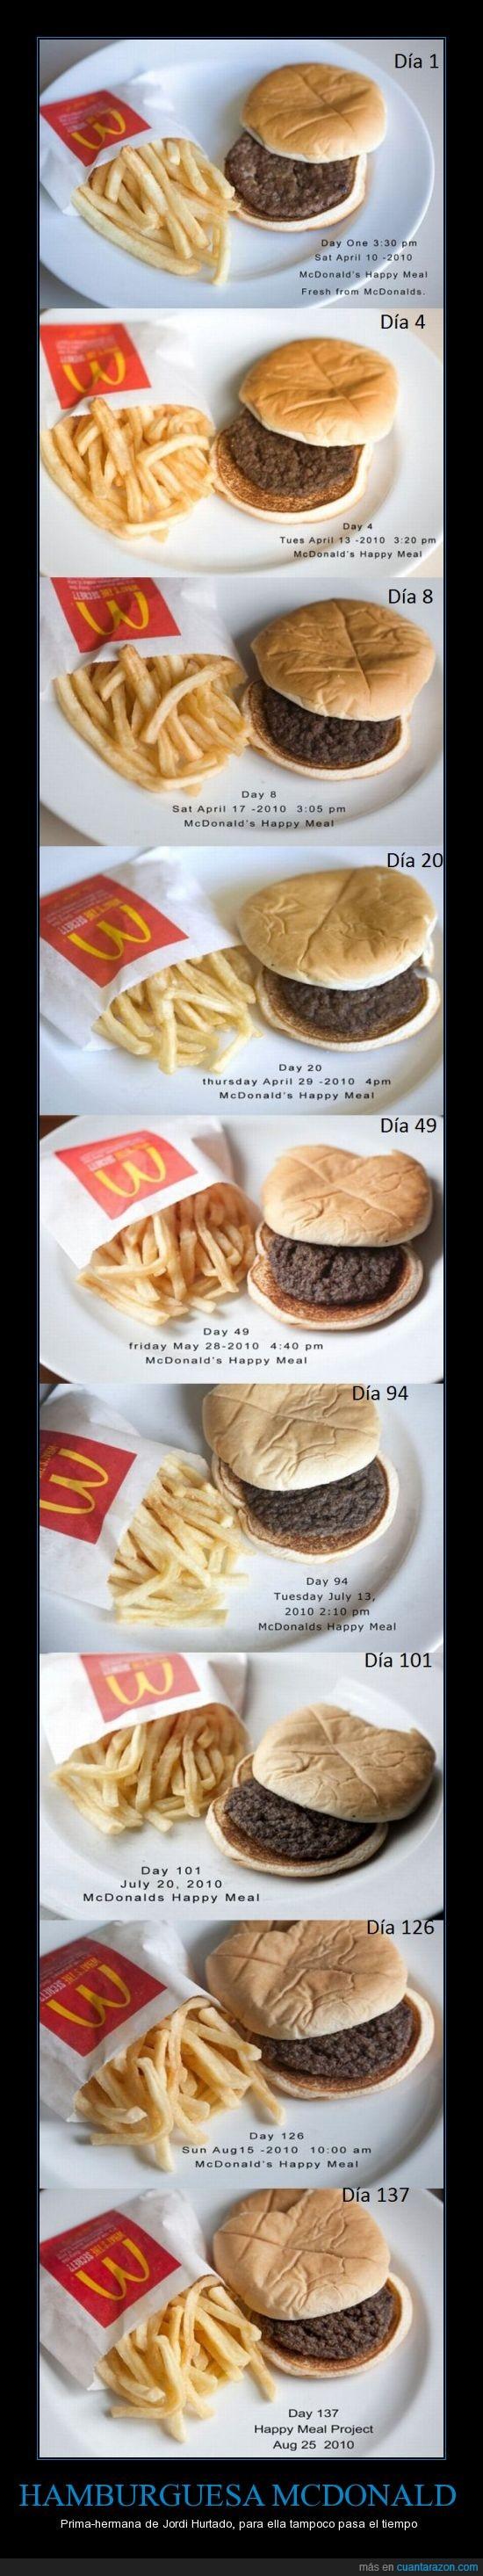 137,dias,hamburguesa,jordi hurtado,mcdonalds,patatas